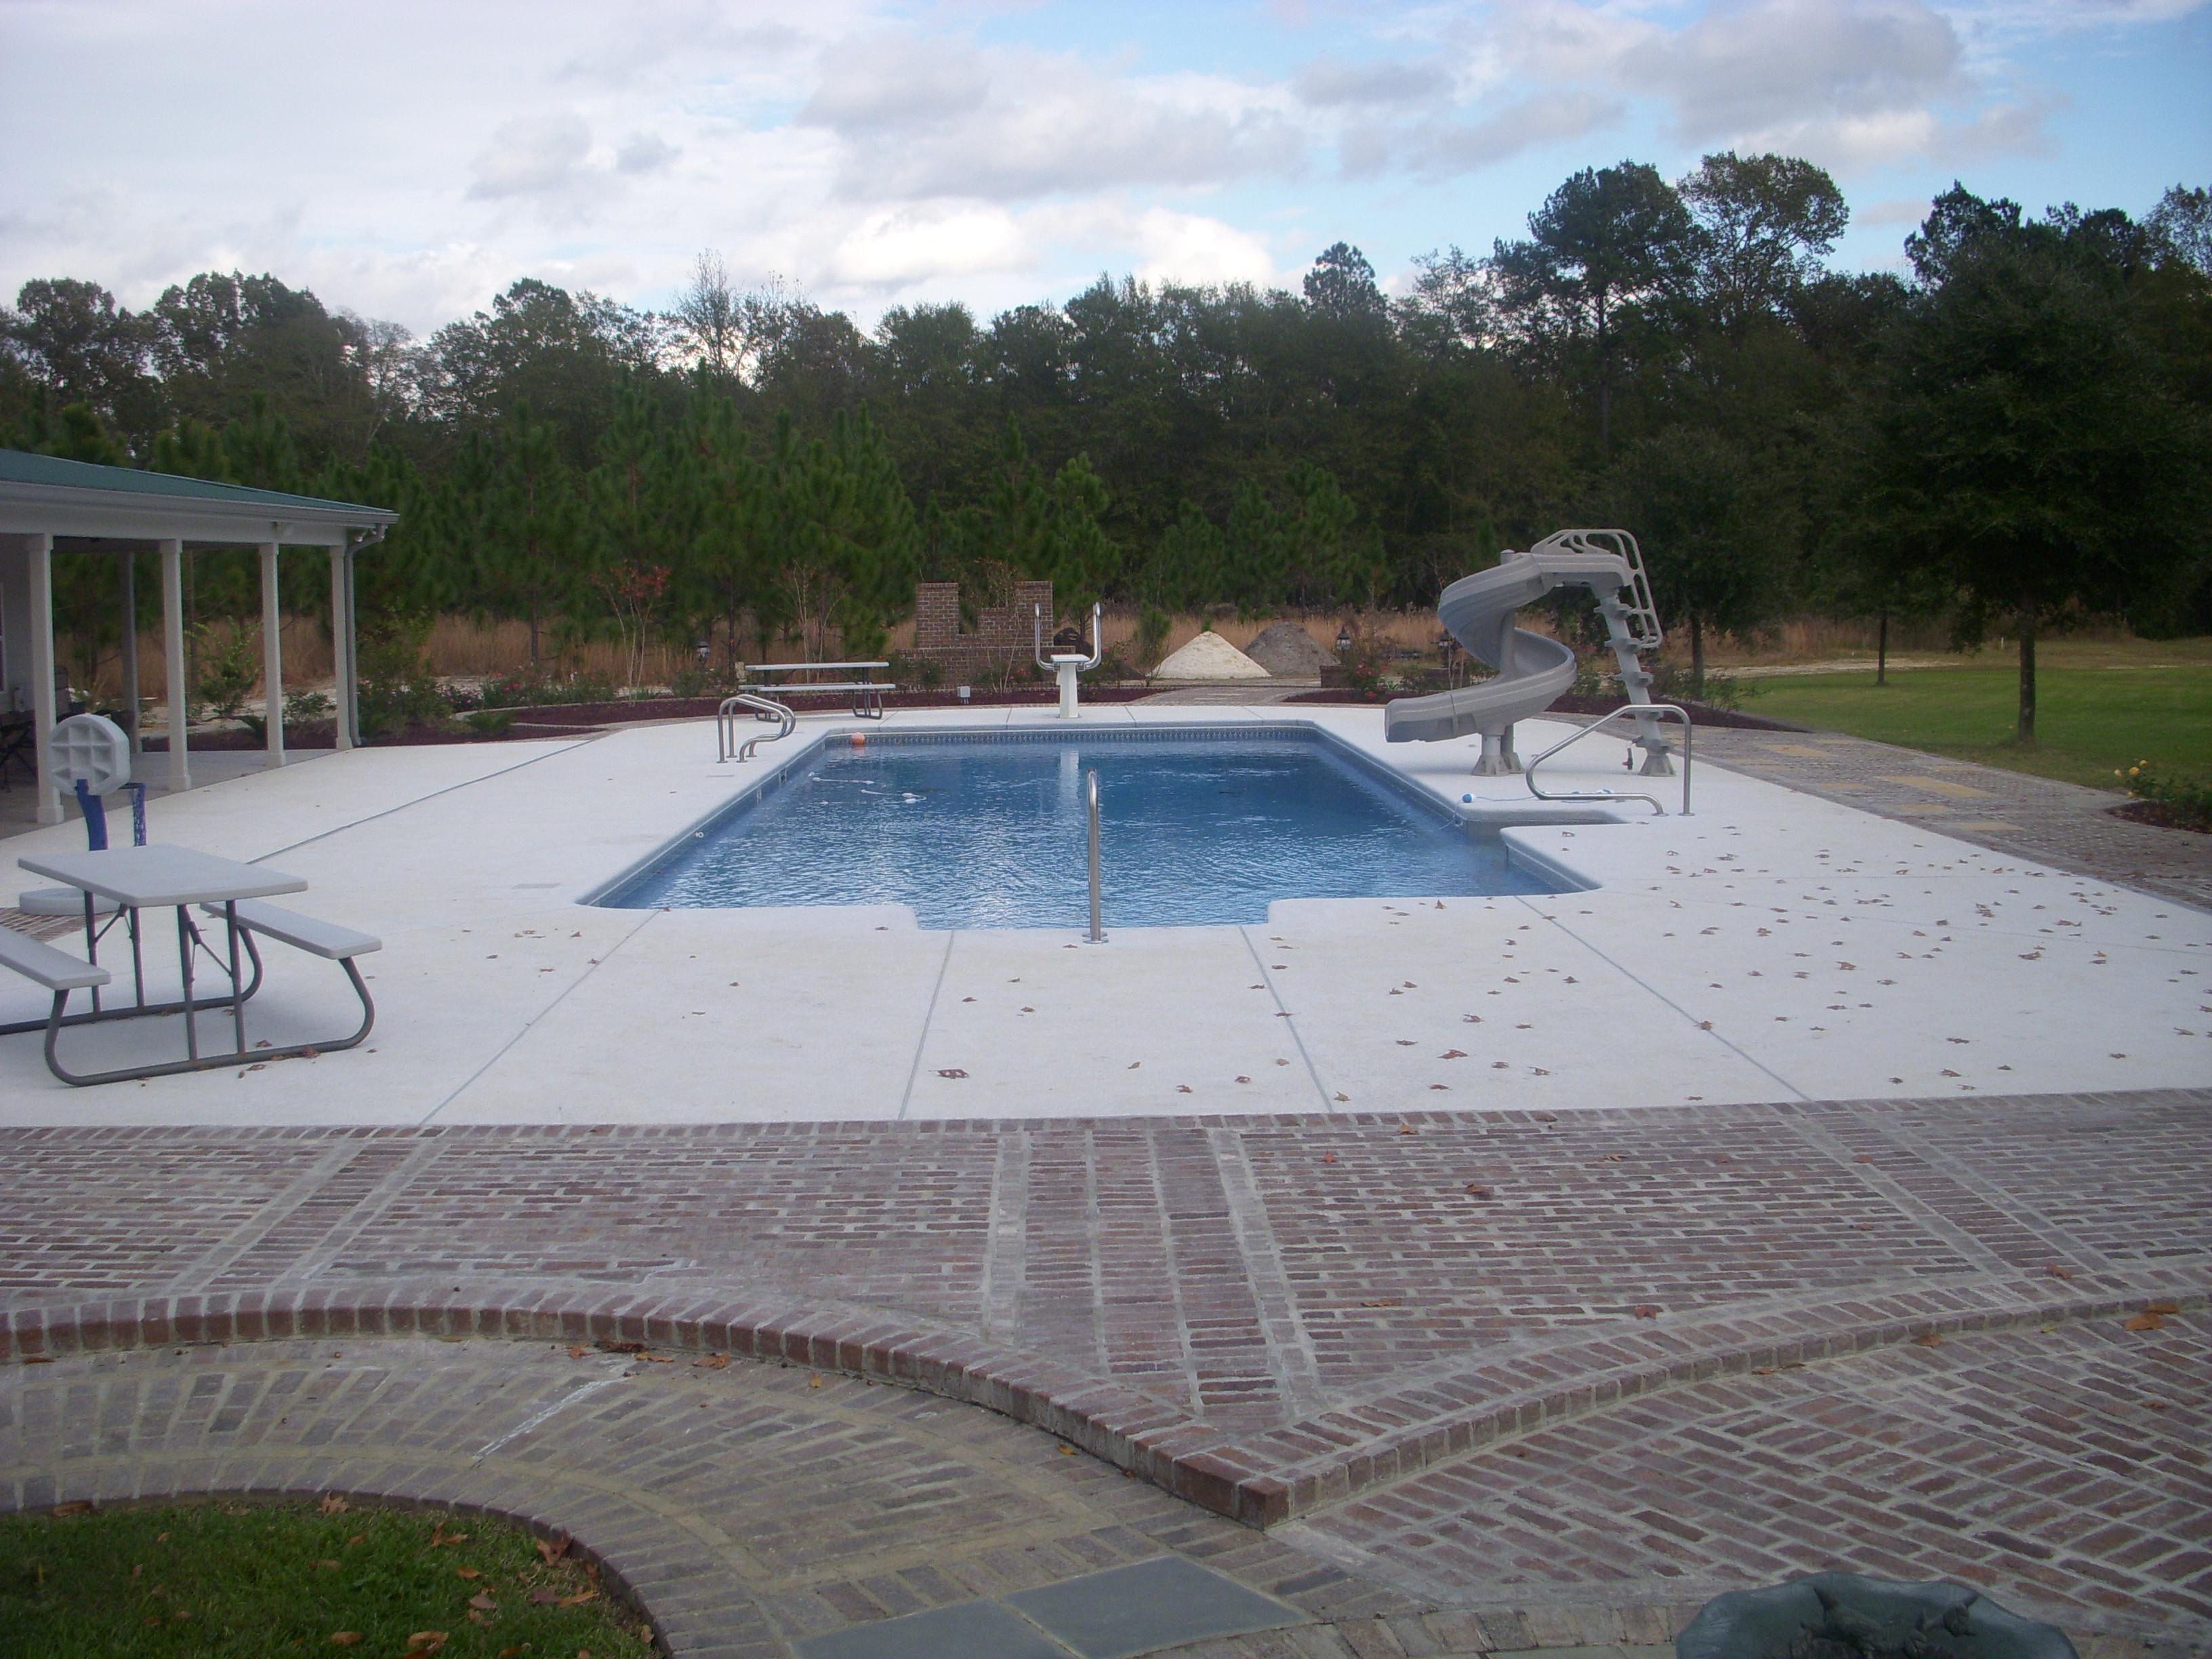 Vinyl Pool| Custom Pool Builder| Outdoor Living| Pool Features| Water Slide| Brick Walkway| Statesboro, Georgia| Thompson Pools